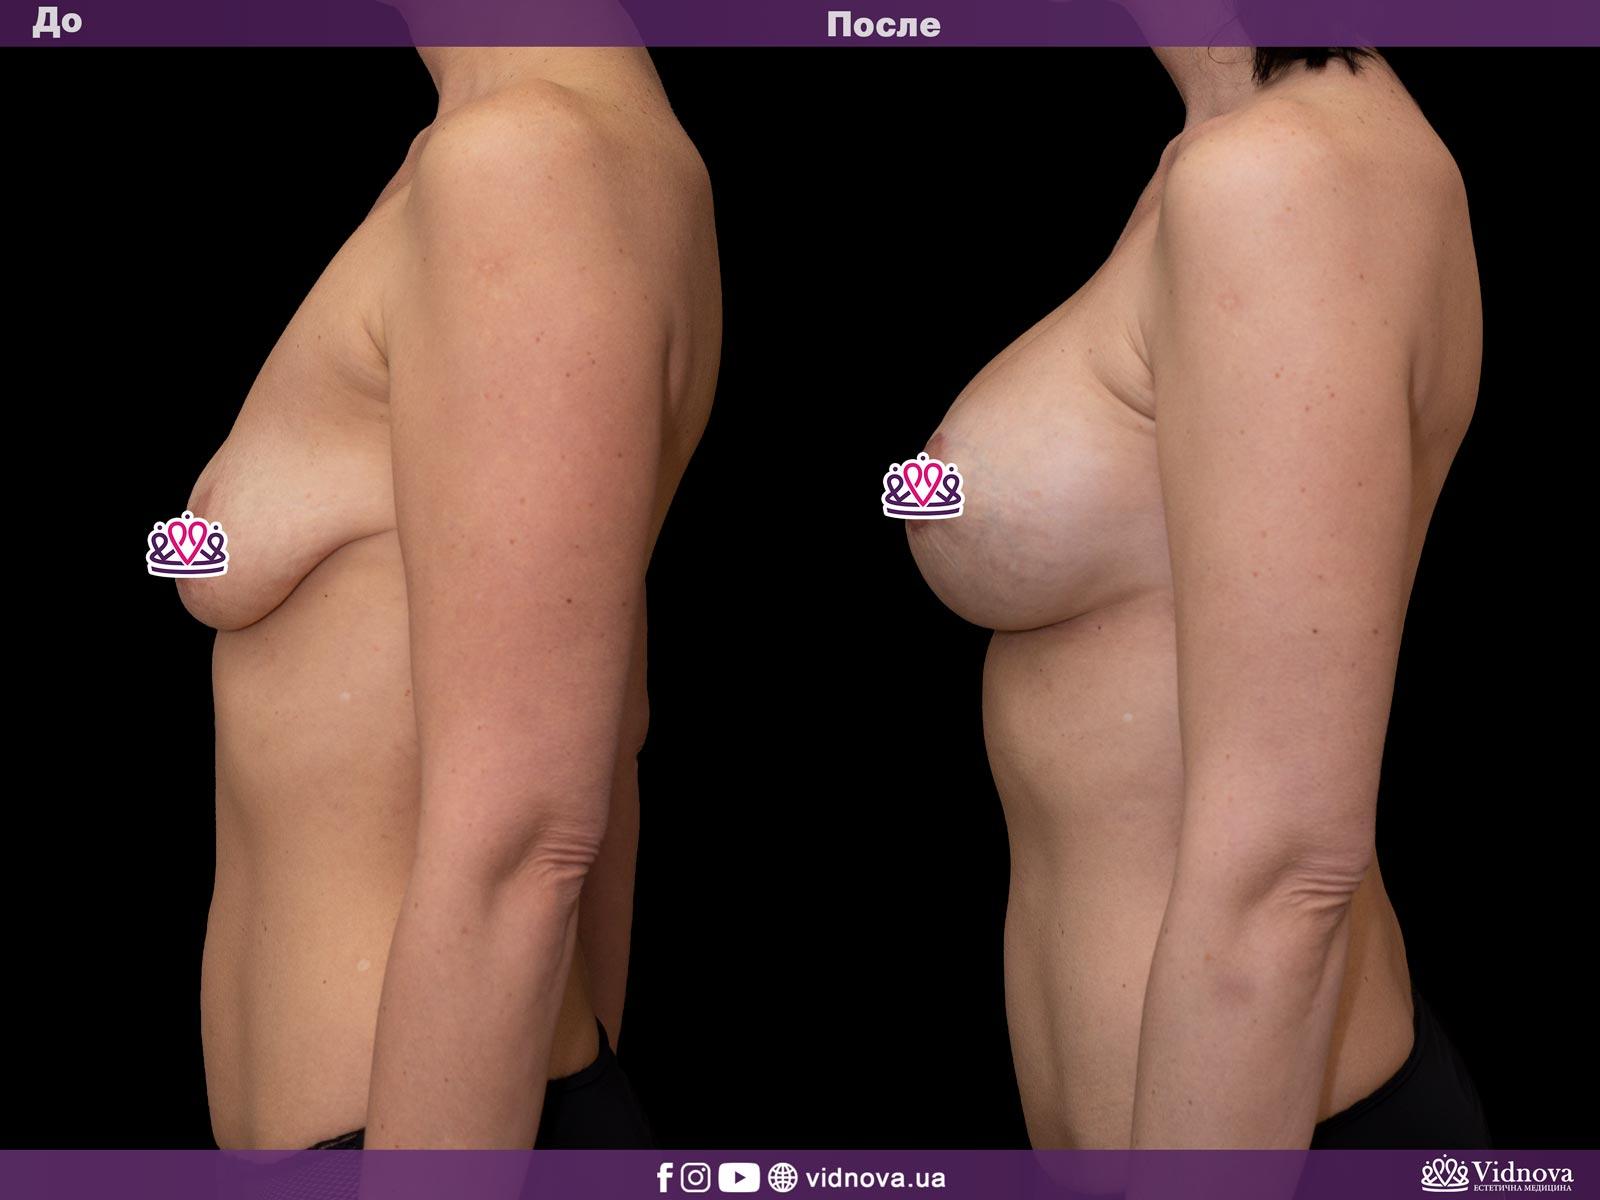 Подтяжка груди: Фото ДО и ПОСЛЕ - Пример №13-3 - Клиника Vidnova